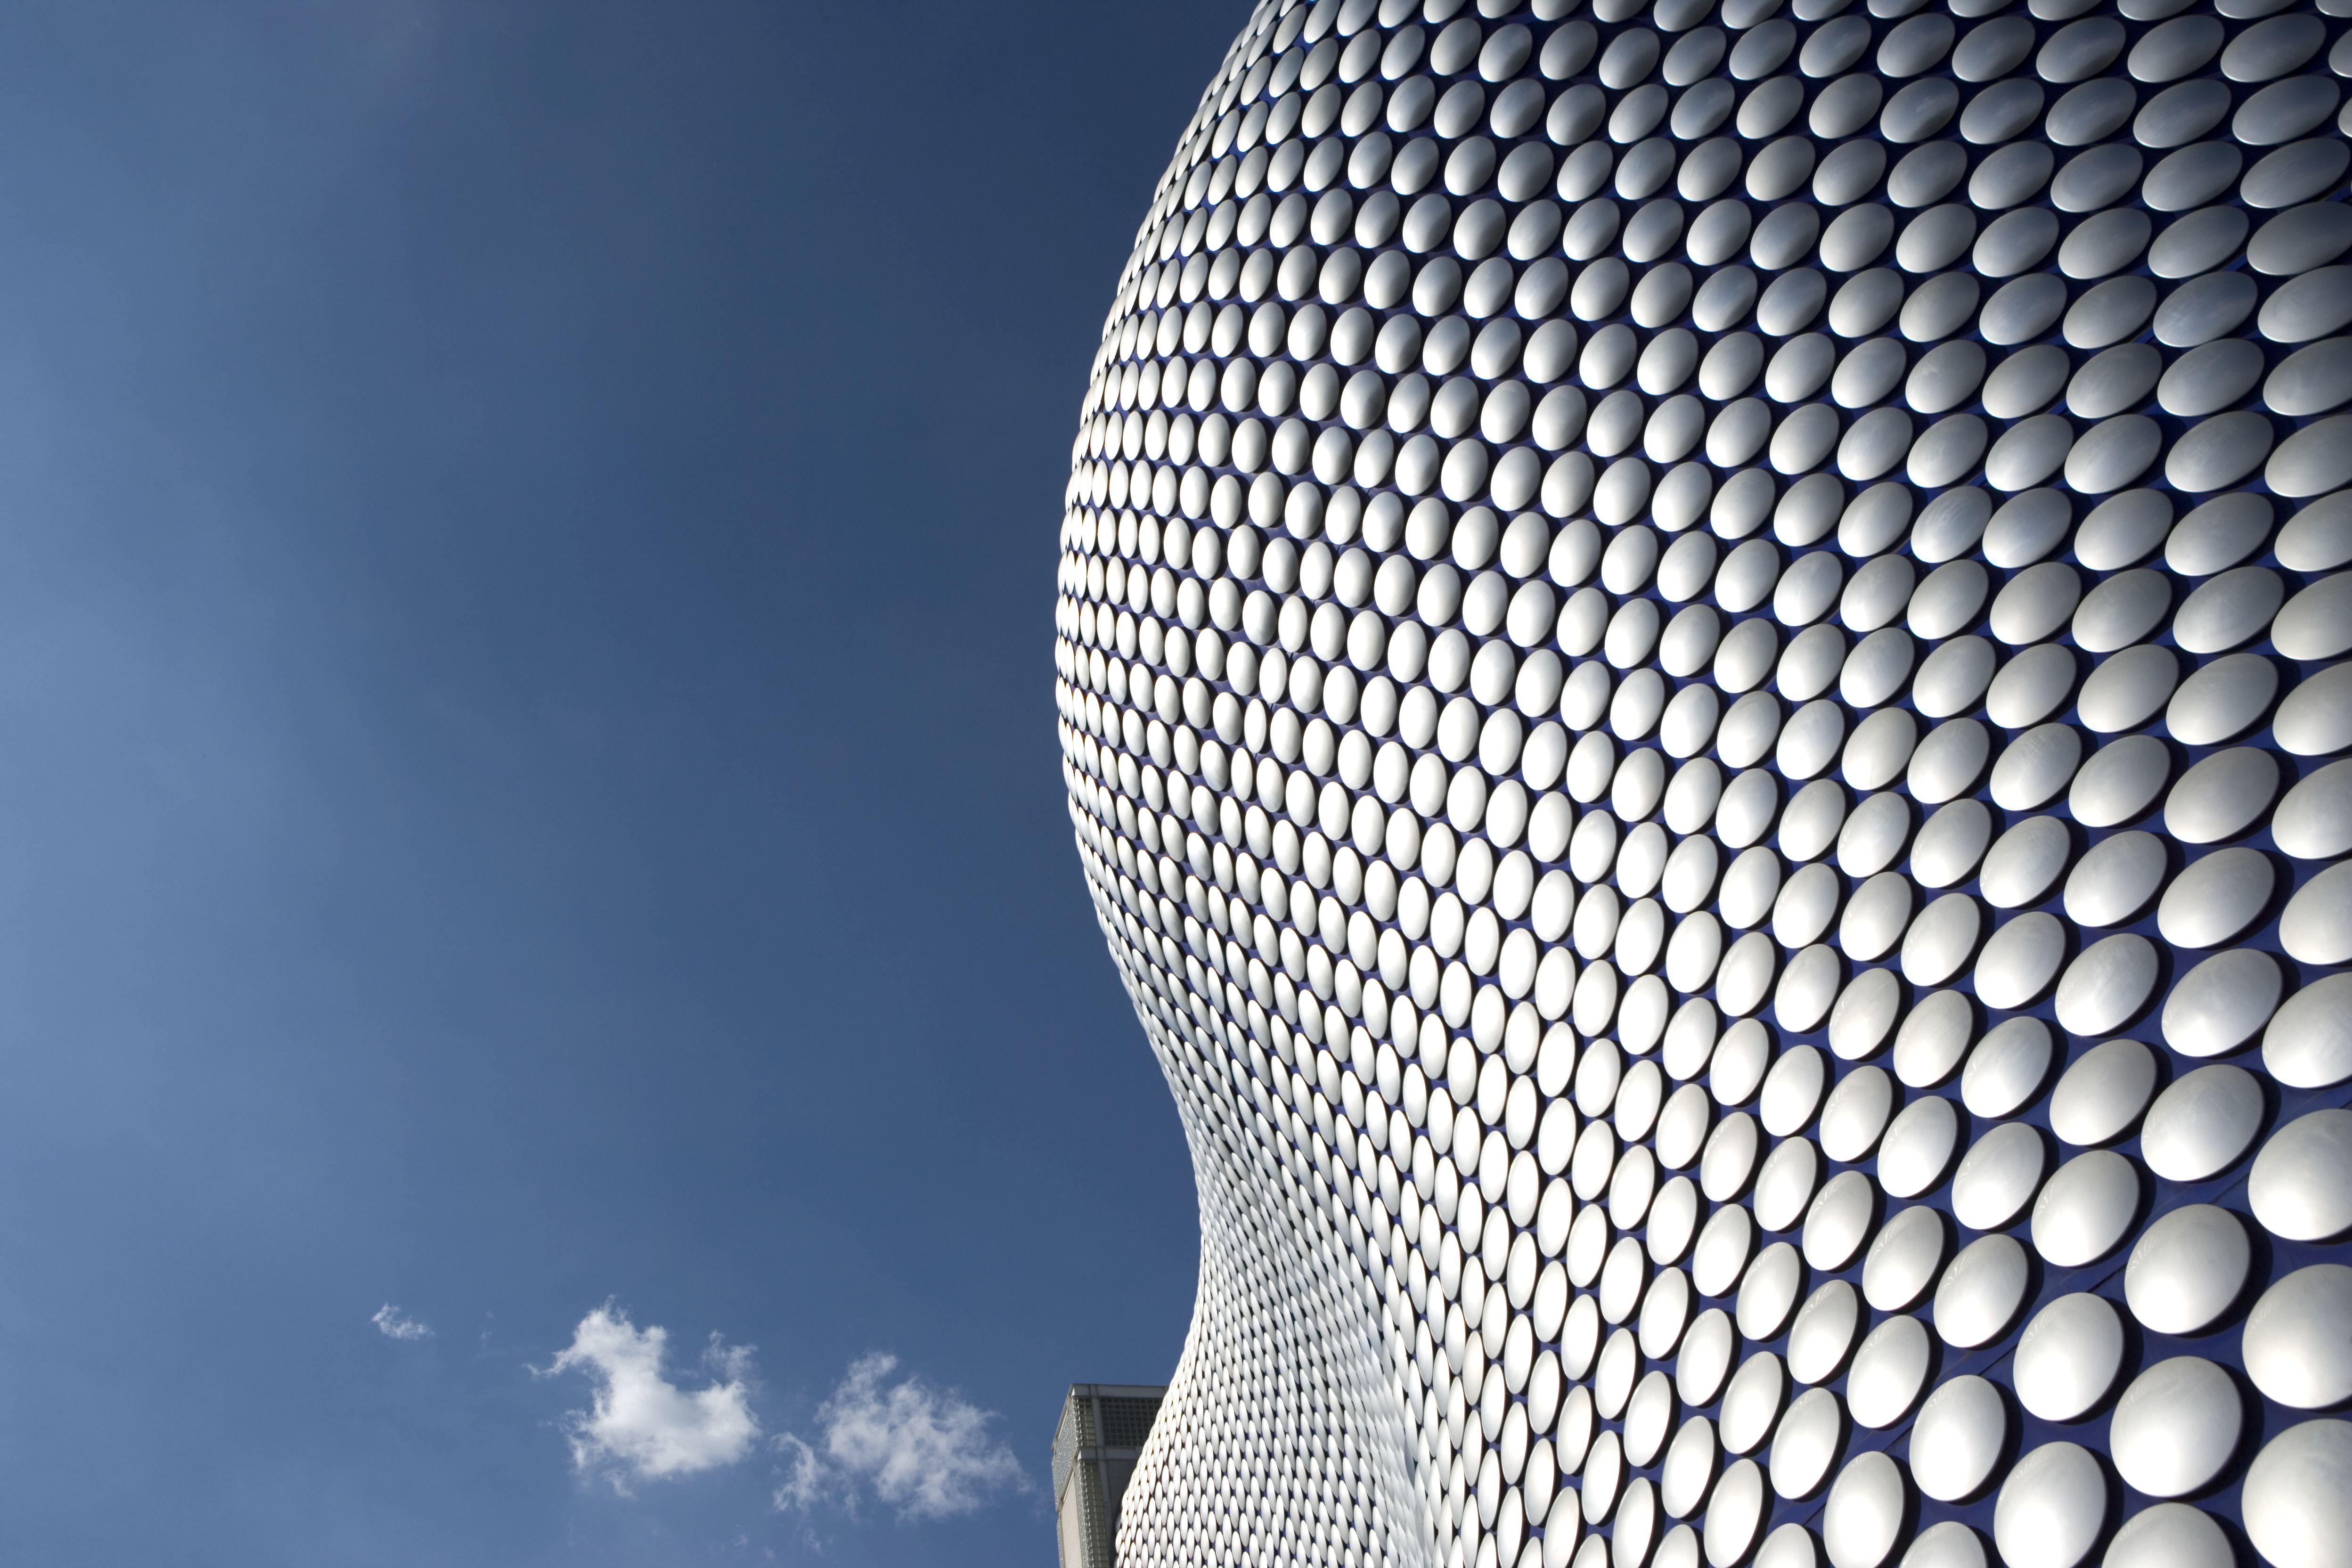 Shiny discs on Selfridges store, blobitecture in Birmingham, England